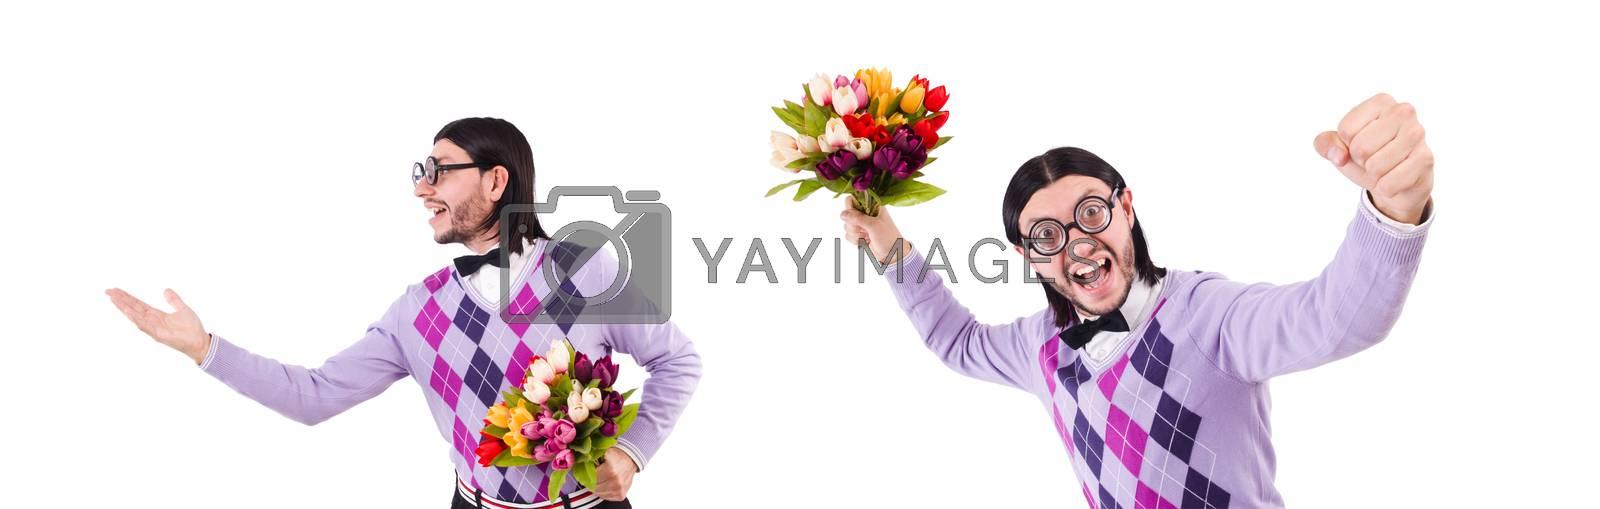 Man holding tulips isolated on white